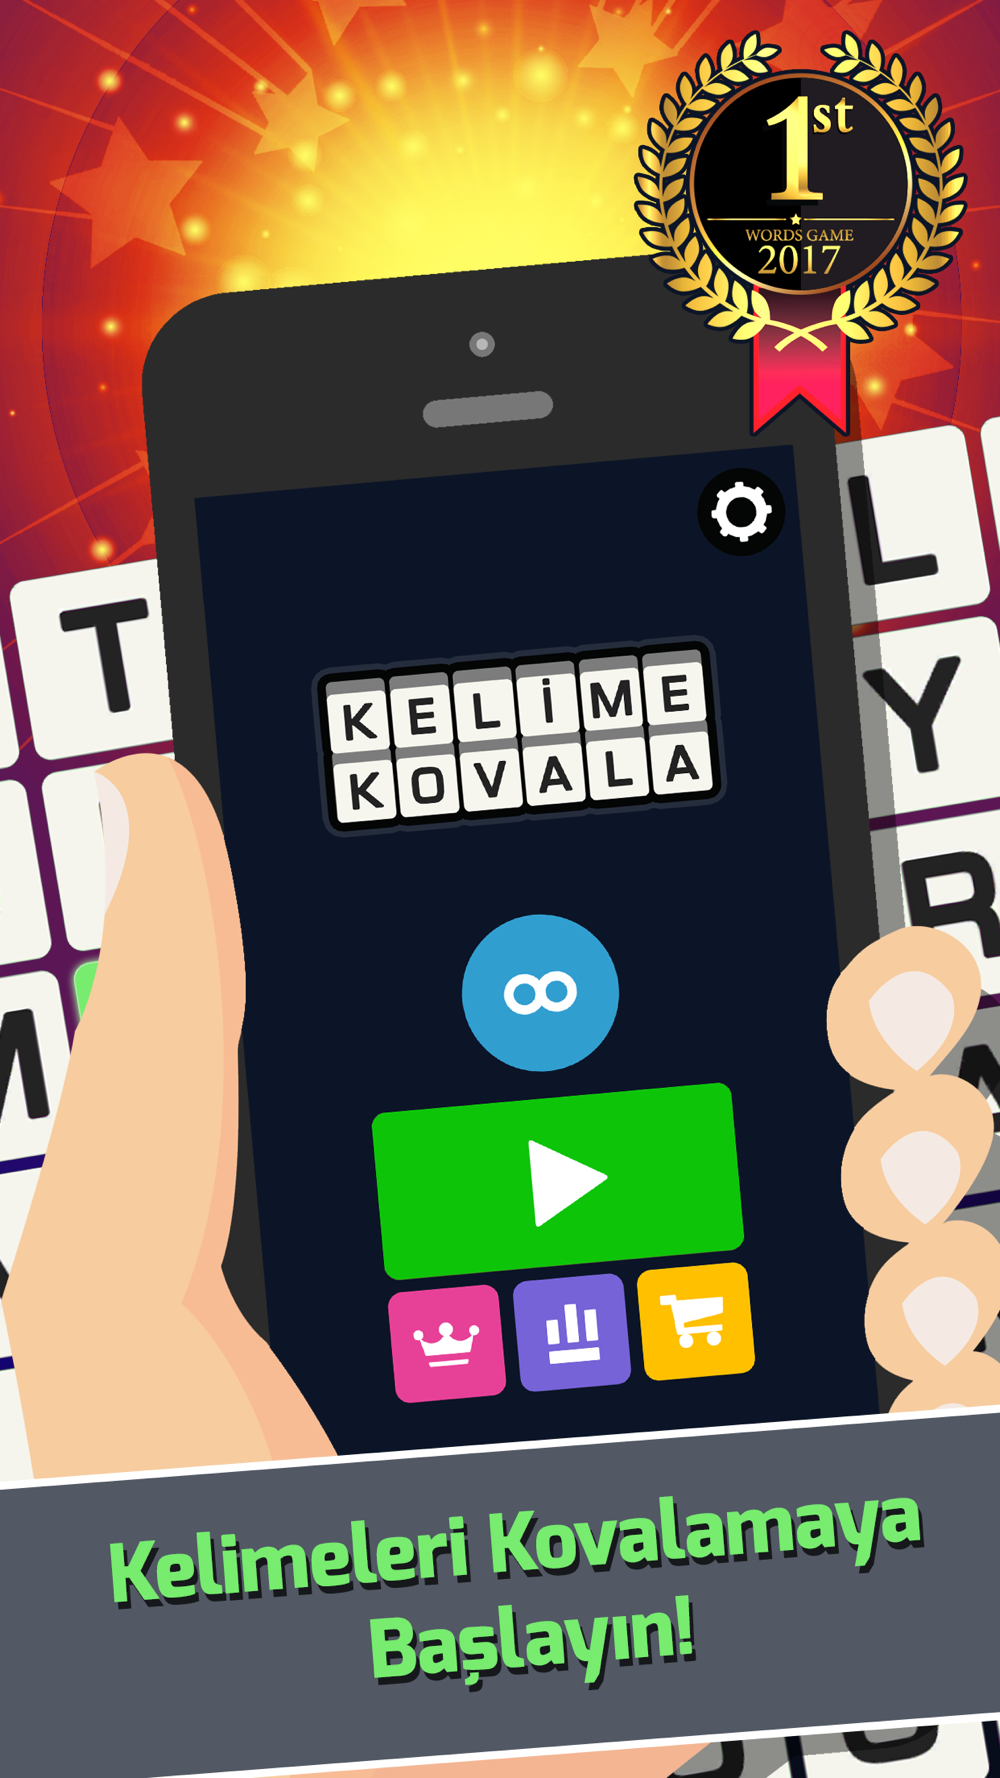 Kelime KovalaTürkçe Kelime Free Download App for iPhone - STEPrimo.com